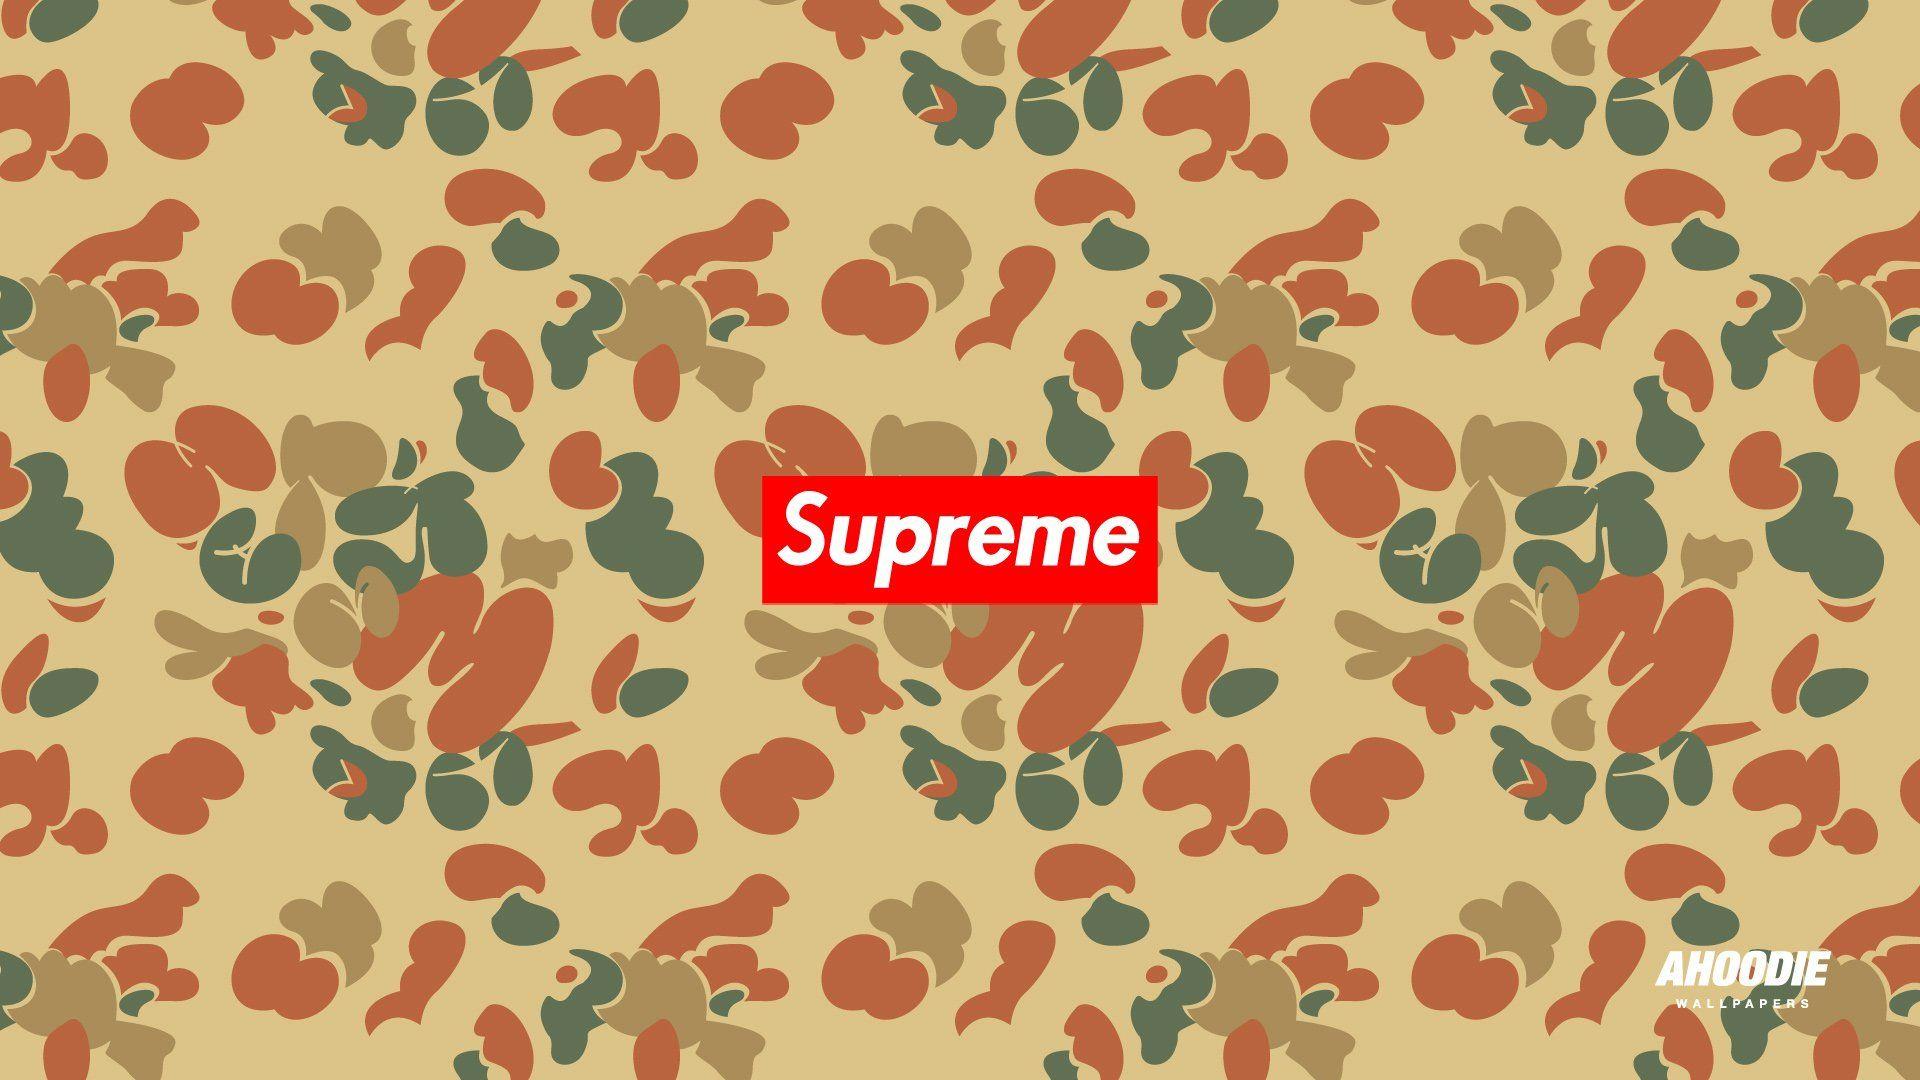 Free Download Supreme Wallpaper 71 Wallpapers 3d Wallpapers